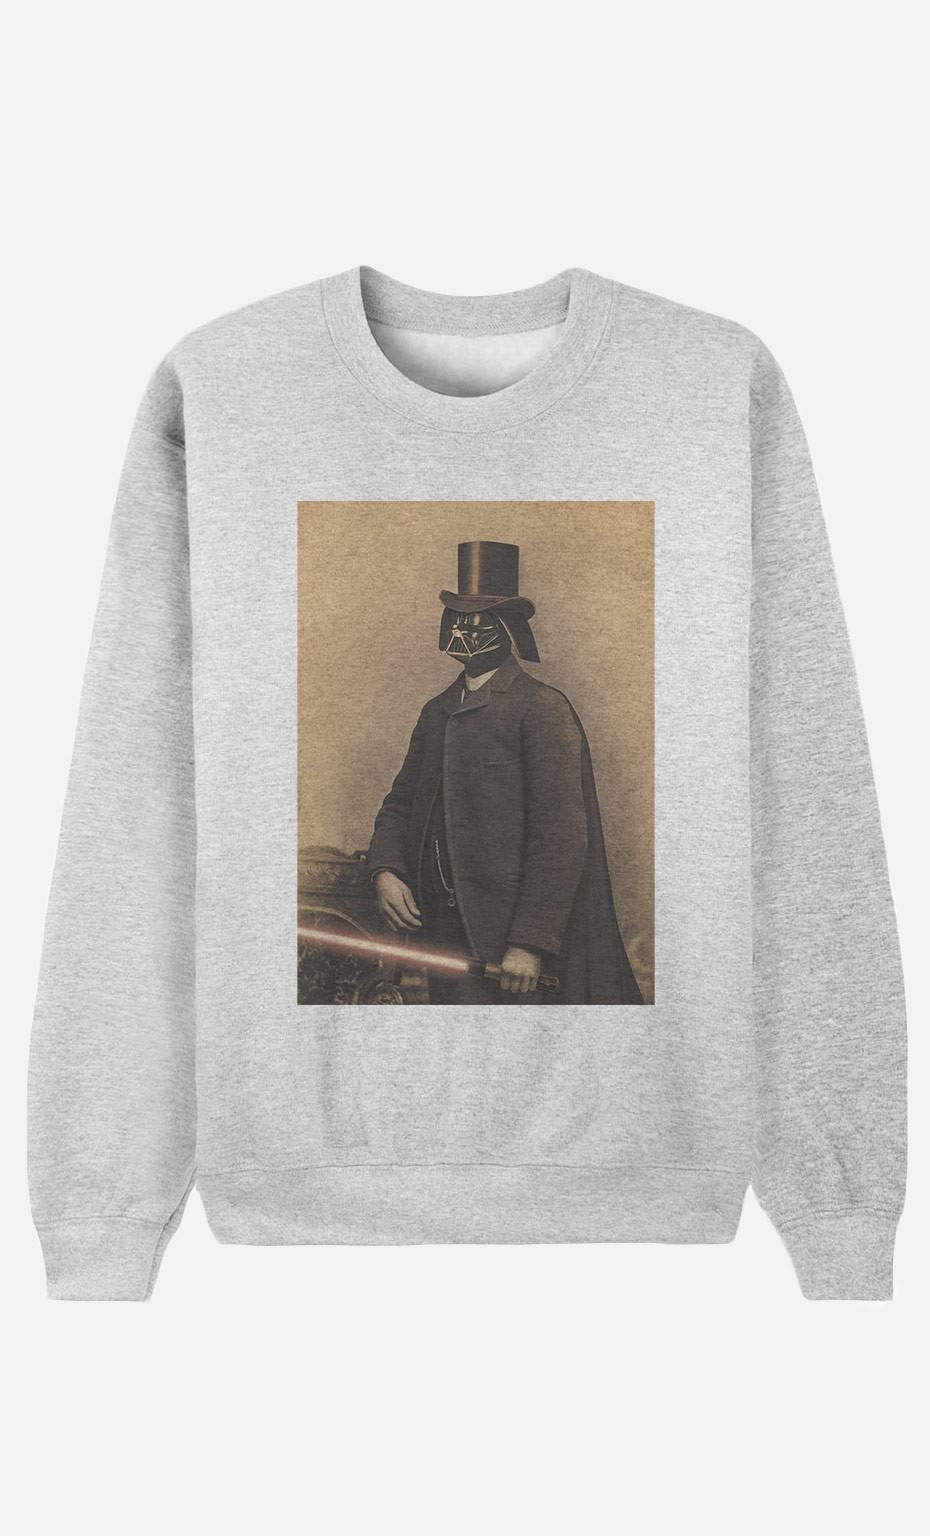 Sweatshirt Lord Vader